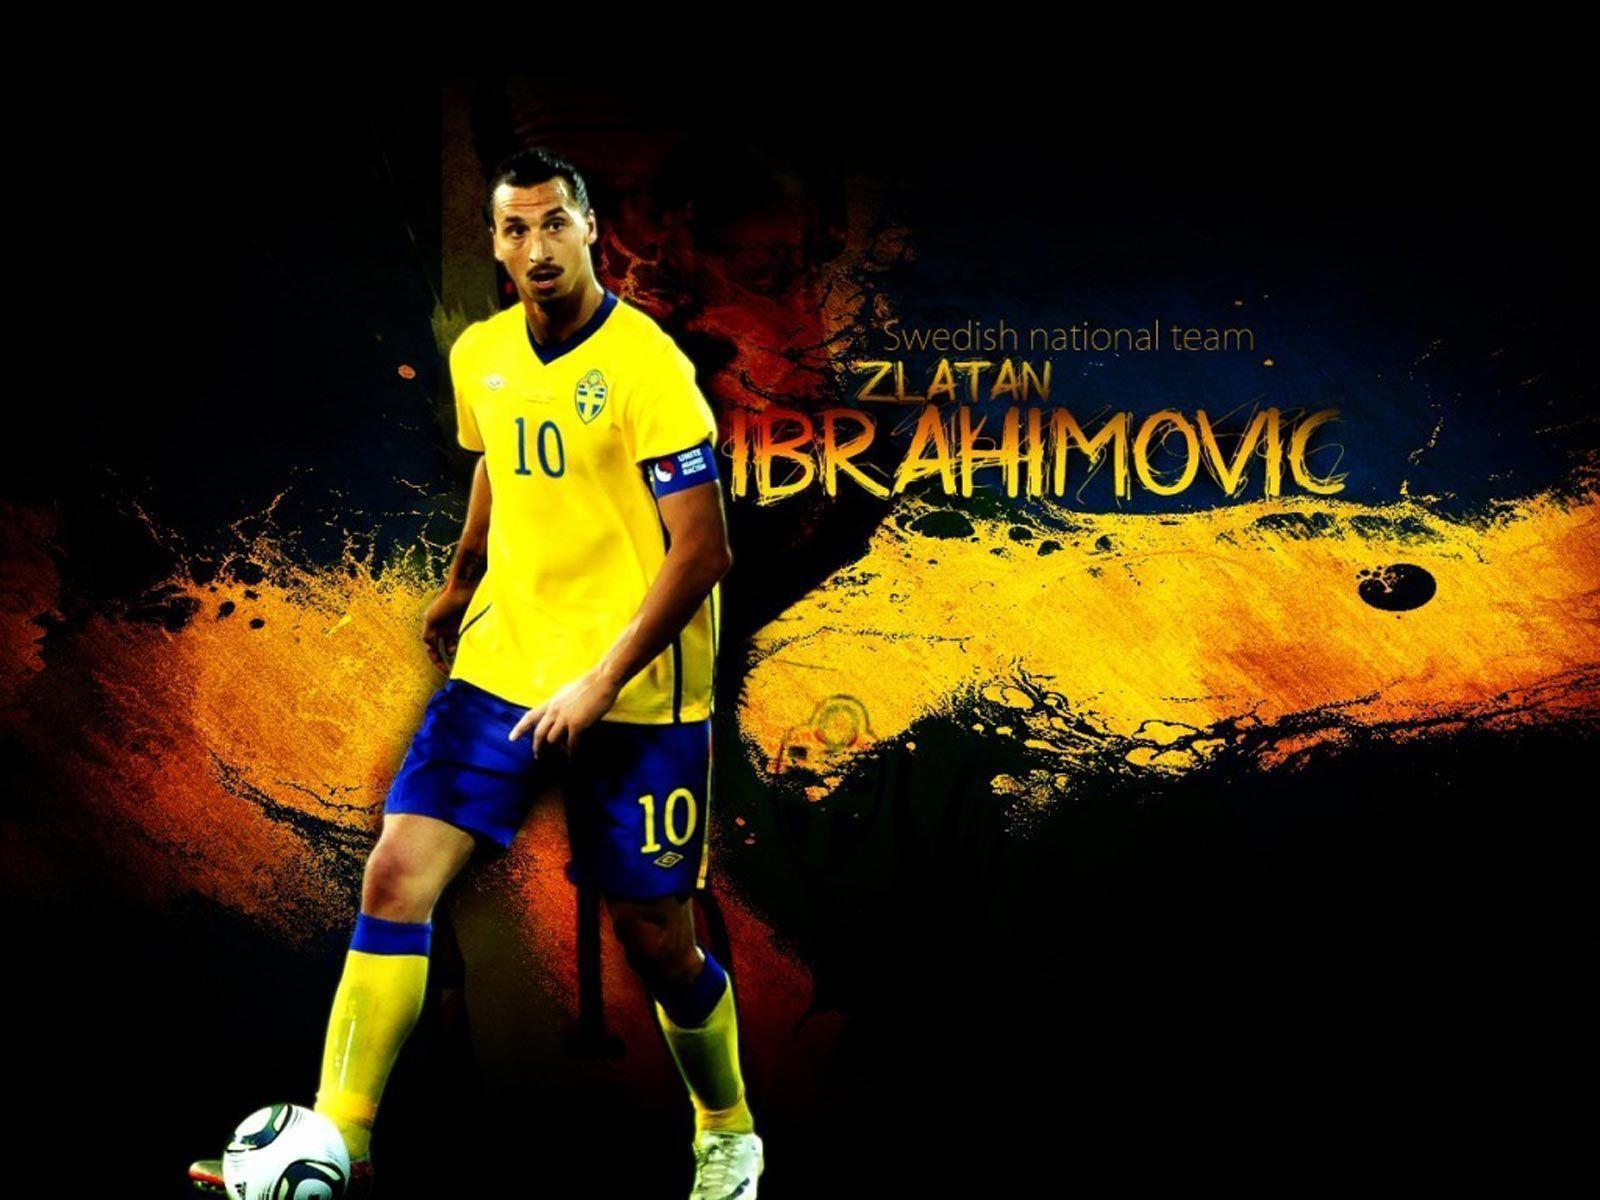 Zlatan Ibrahimovic Swedish National Team Wallpaper, iPhone ...